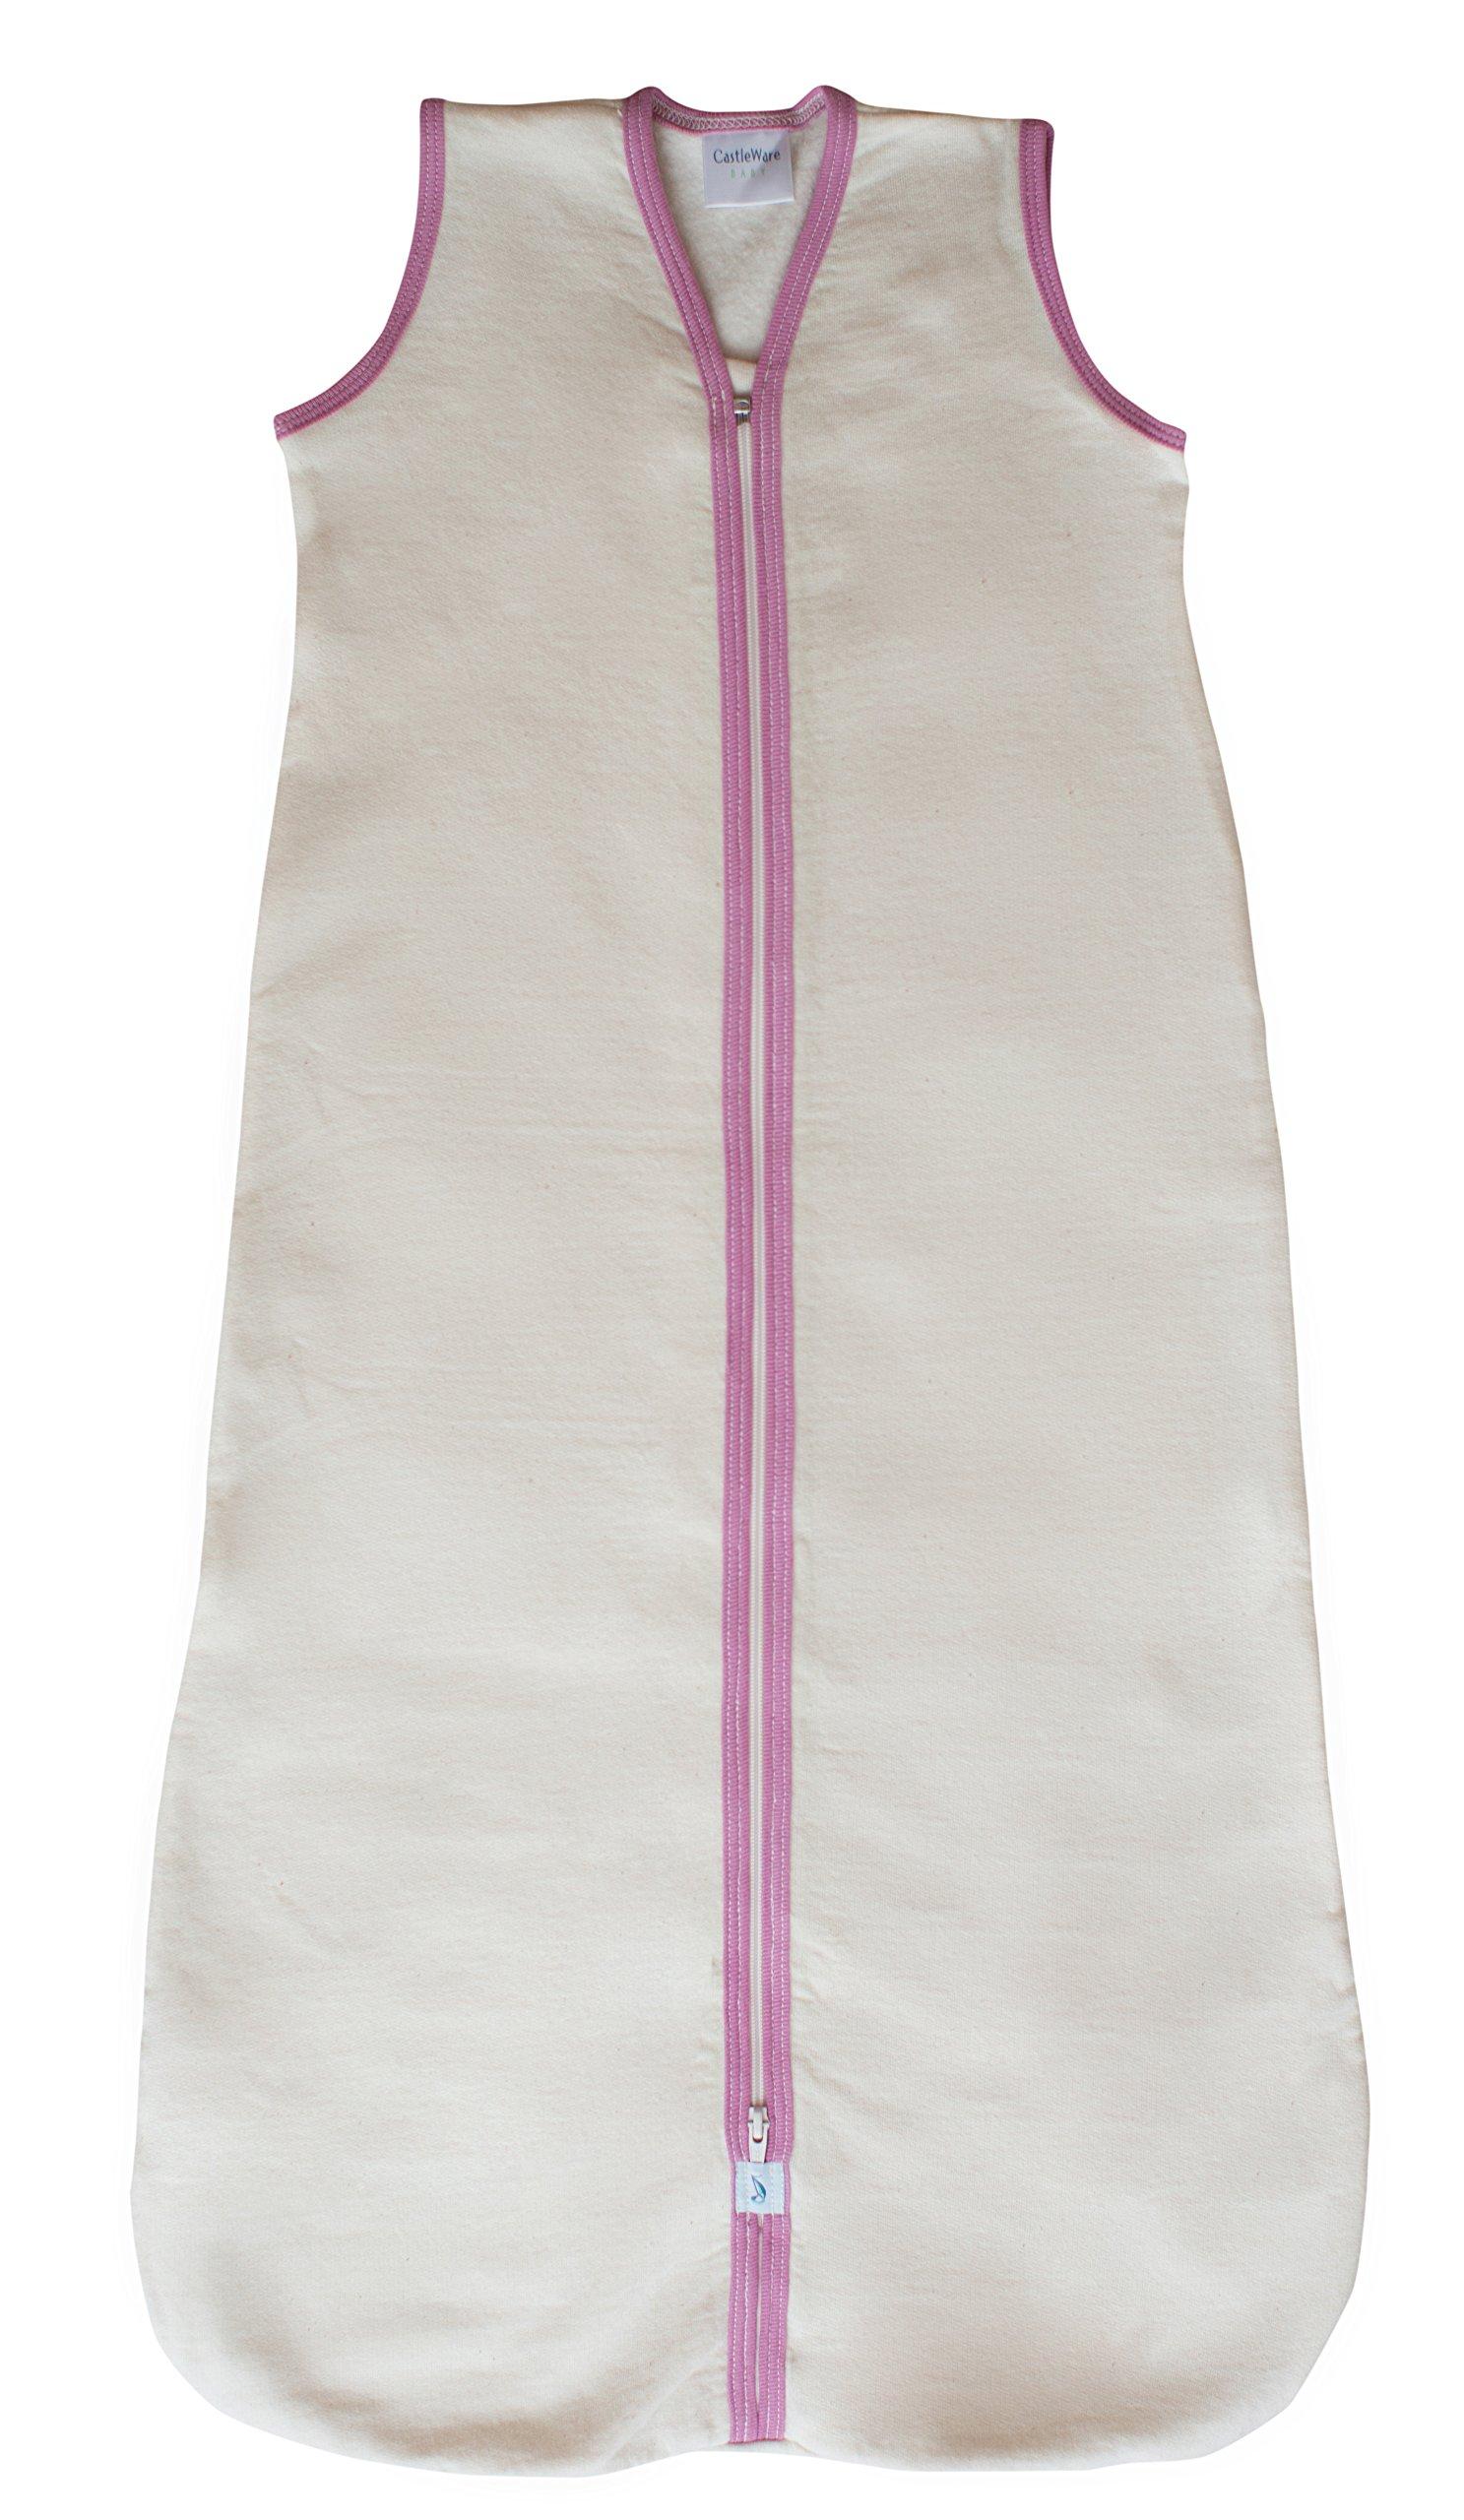 CastleWare Baby Sleeveless Fleece Sleeper Bag (LRG 12-18 Months, Rose Pink) by CastleWare Baby